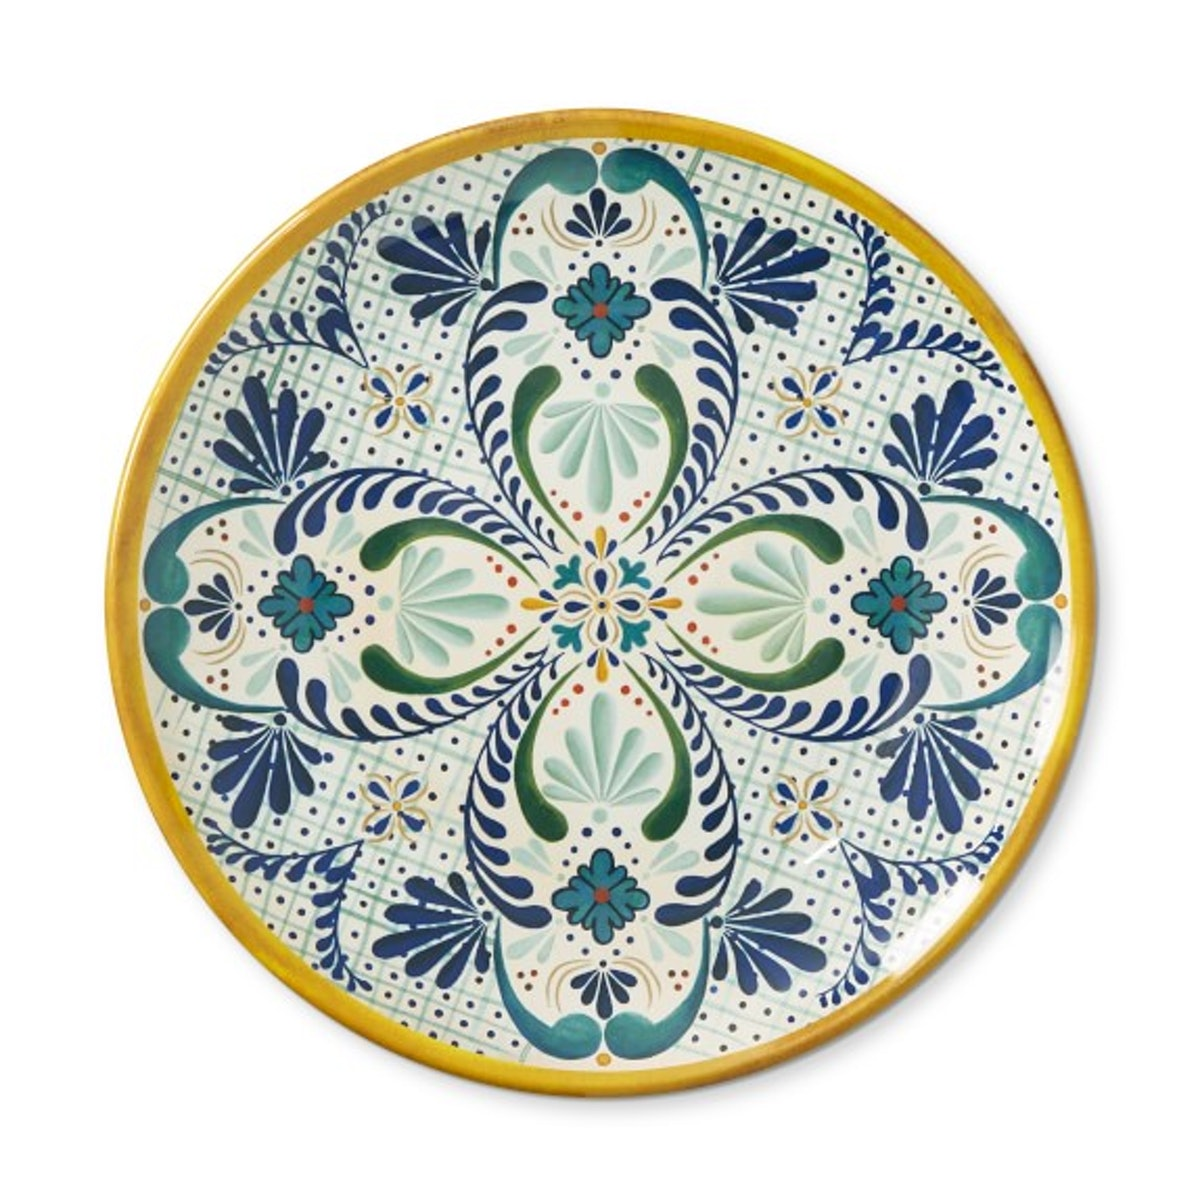 Veracruz Outdoor Melamine Dinner Plates, Yellow (set of 4)